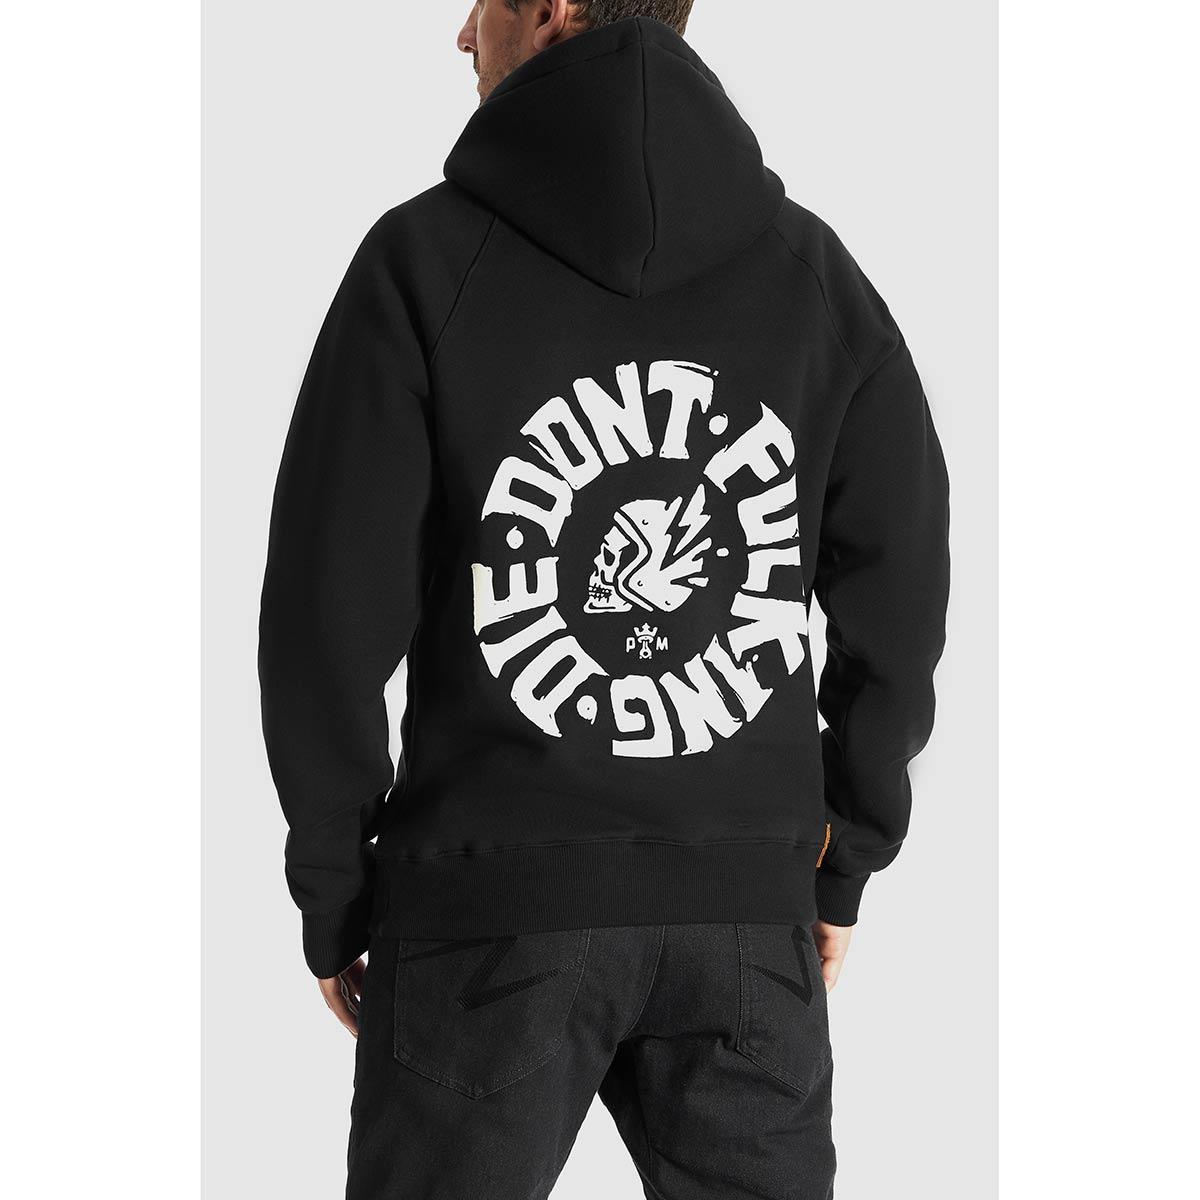 Pando Moto hoodie